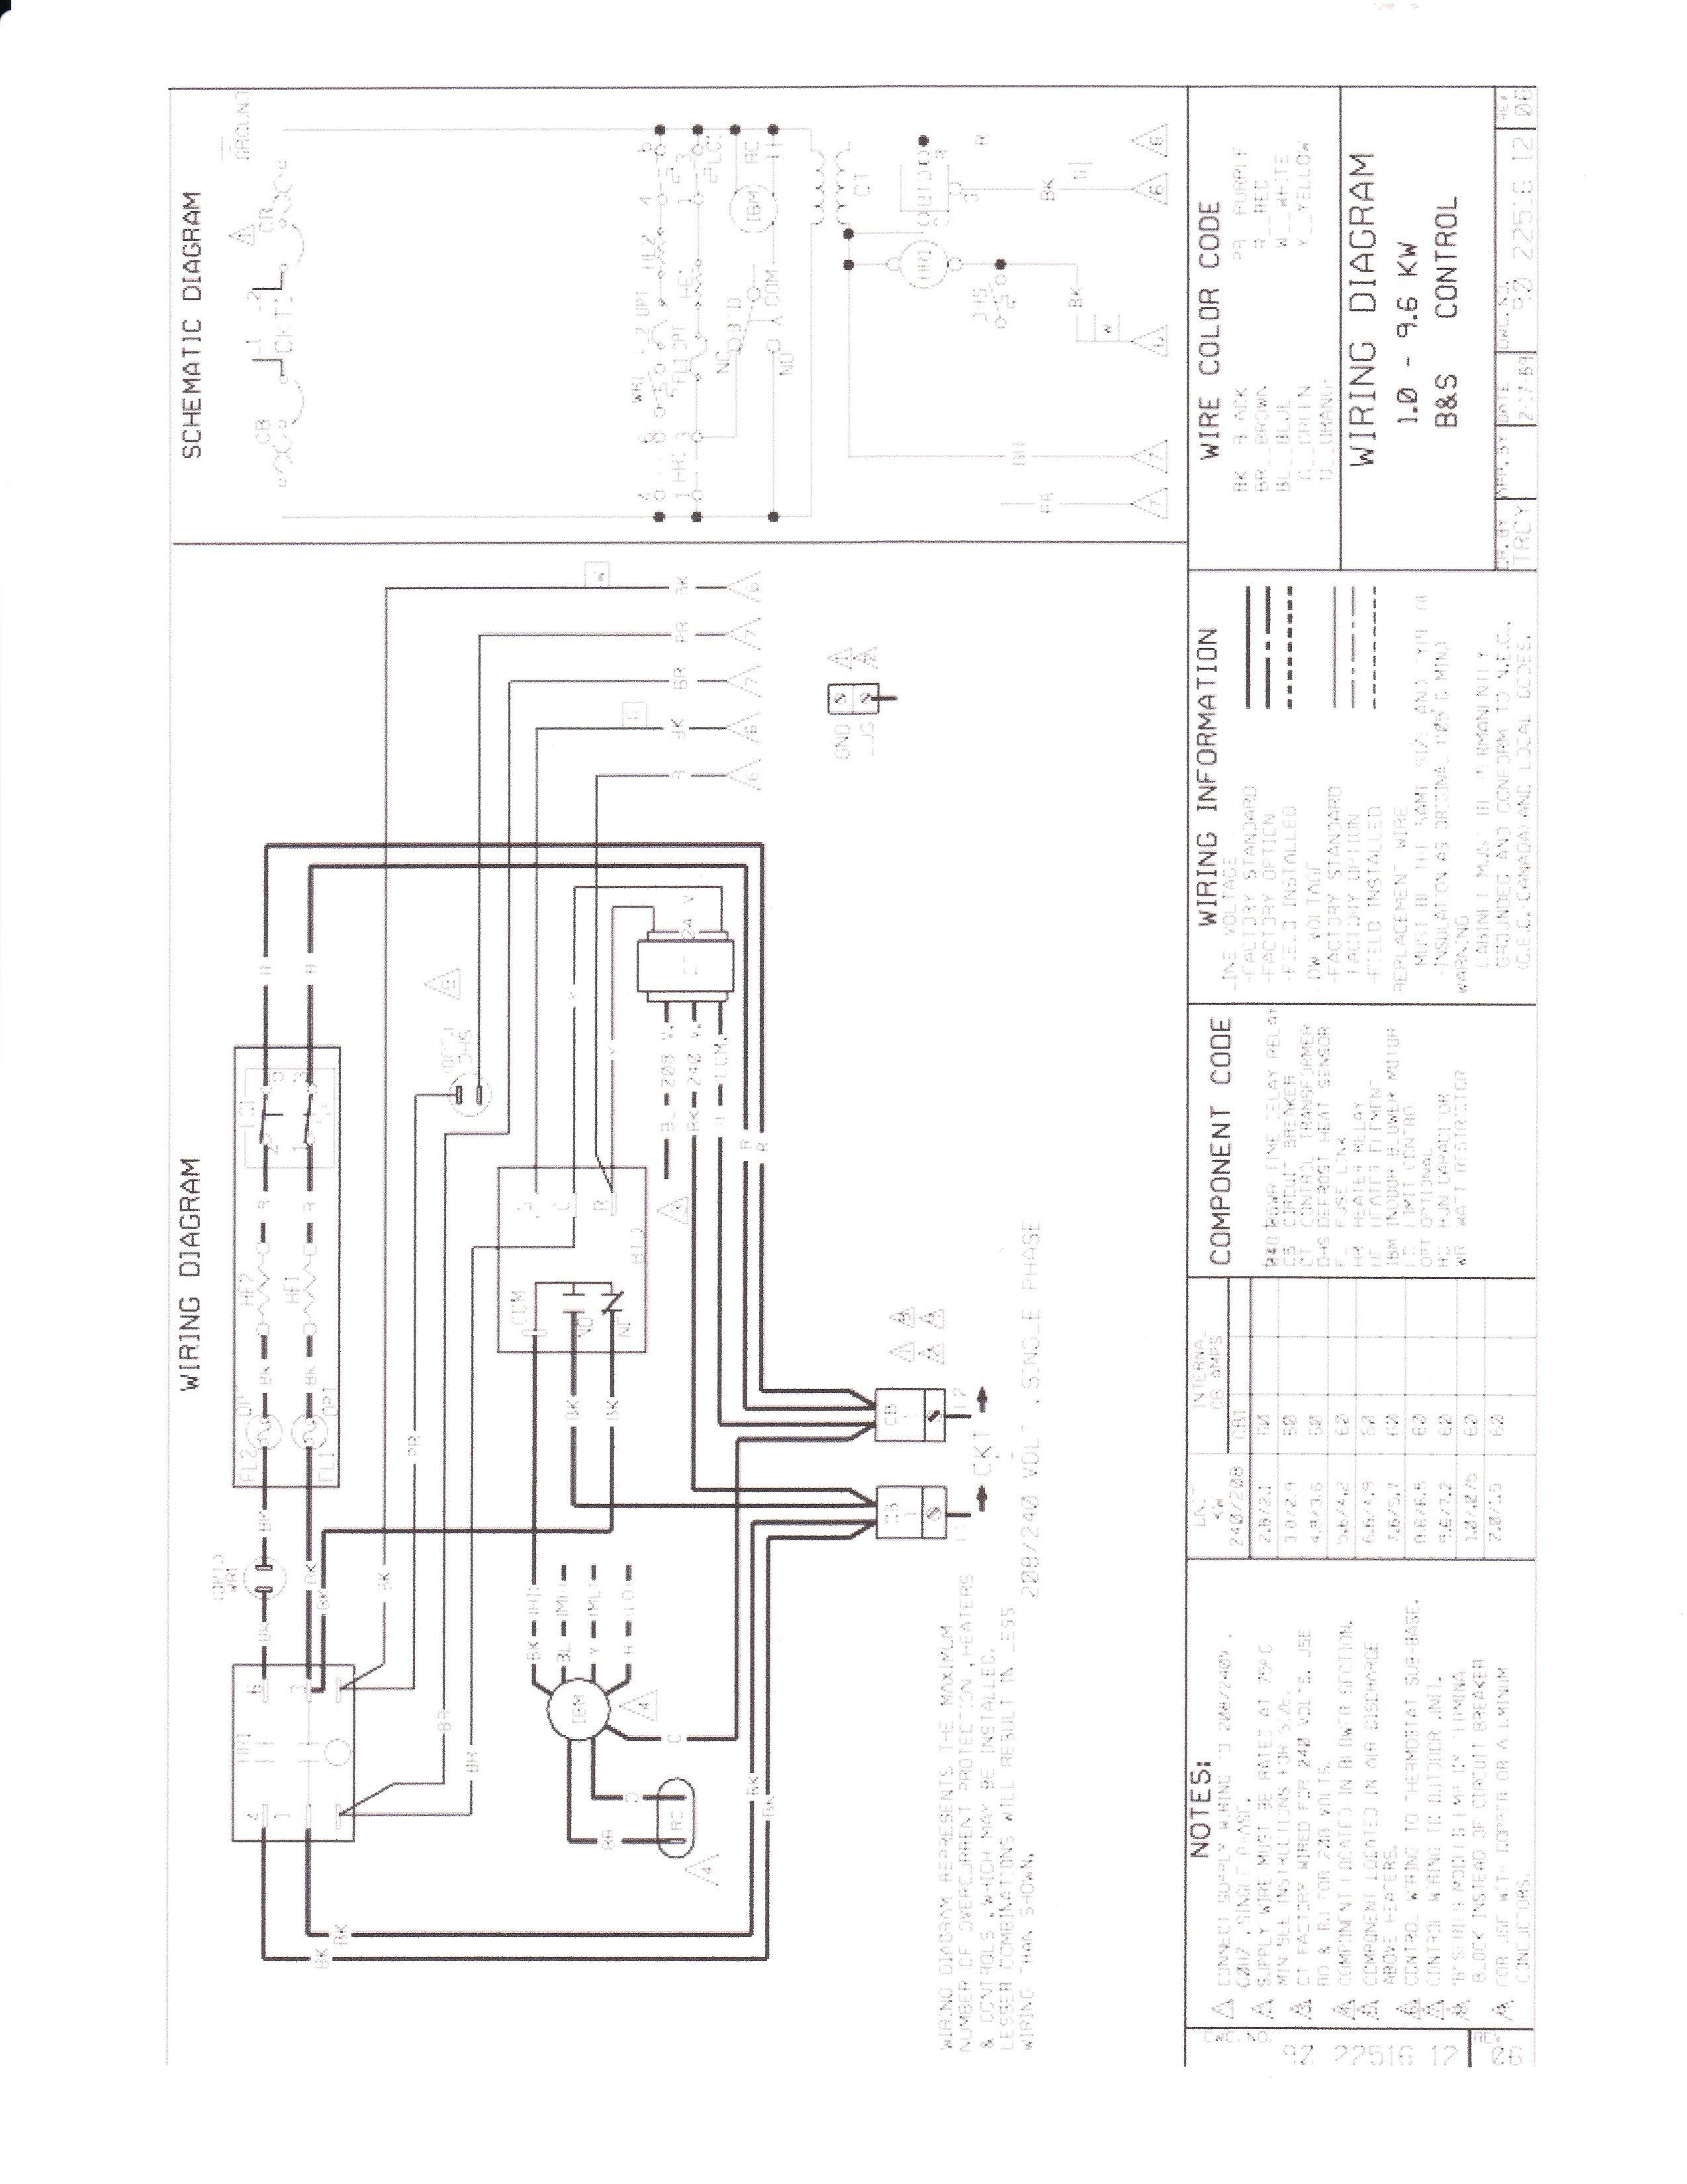 Home Depot Furnace Ac Wiring